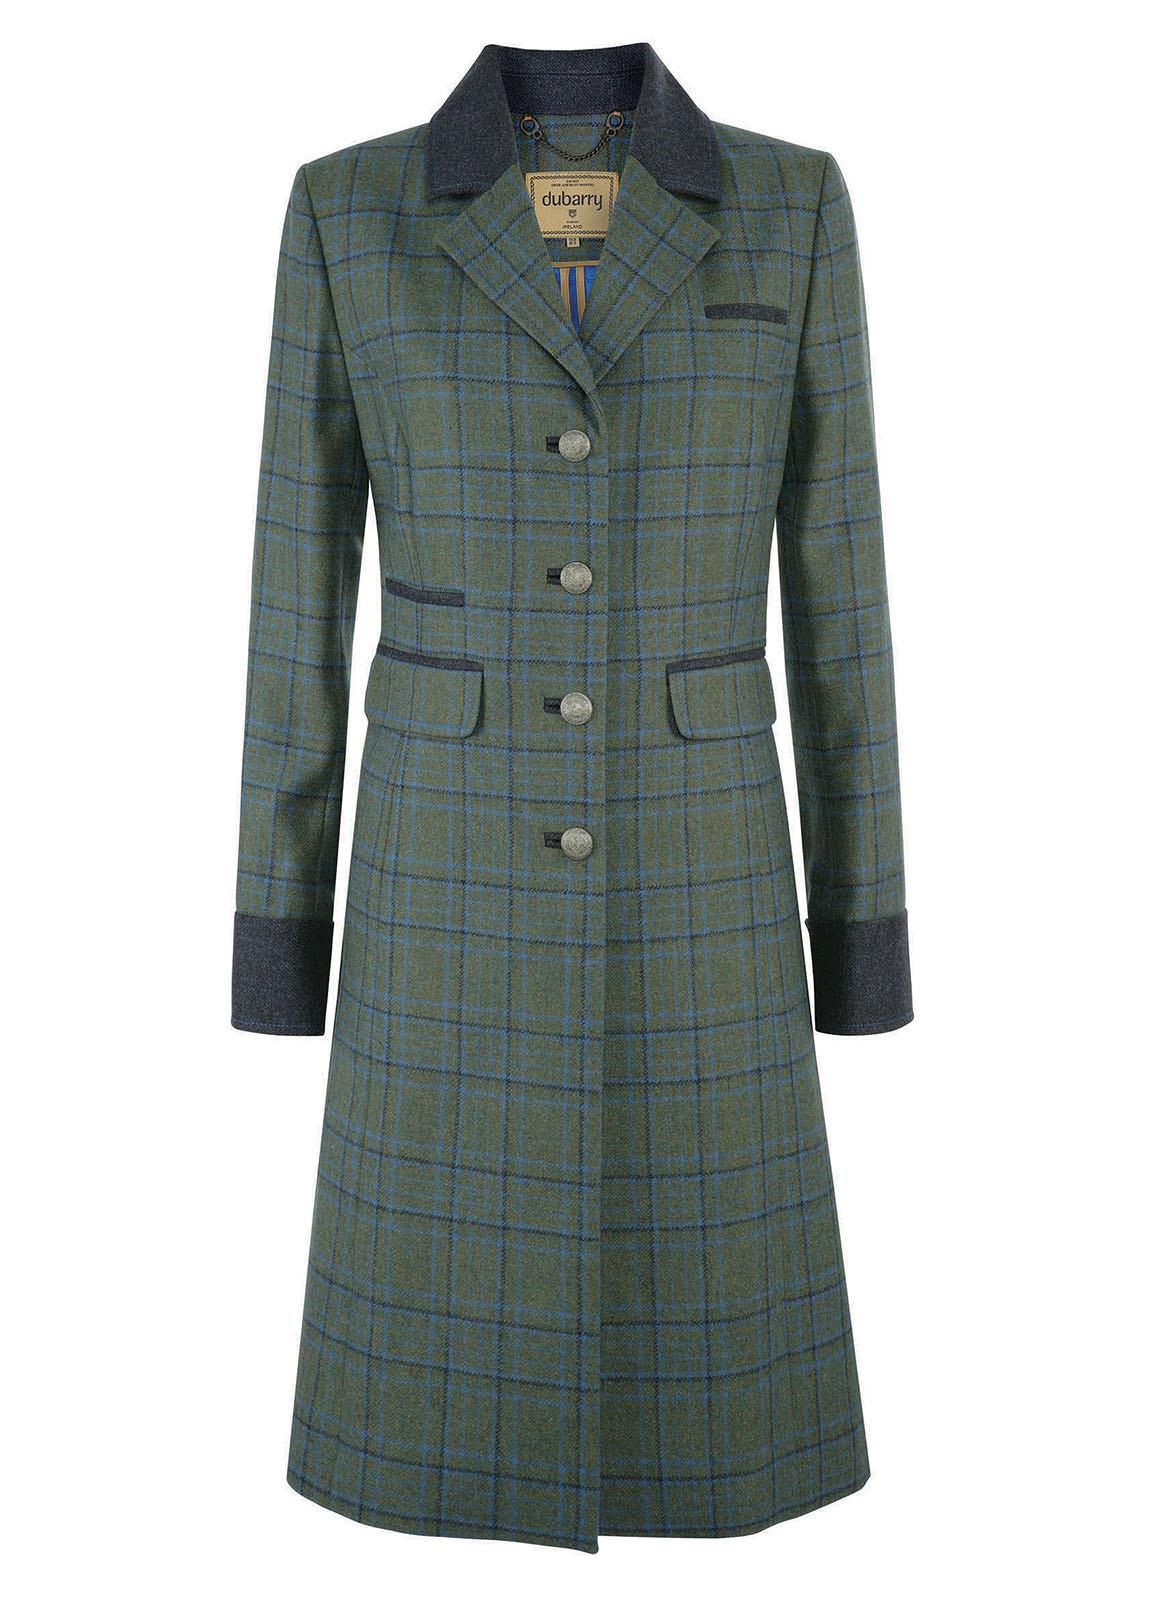 Dubarry_Blackthorn Tweed Jacket  - Blue_Image_2